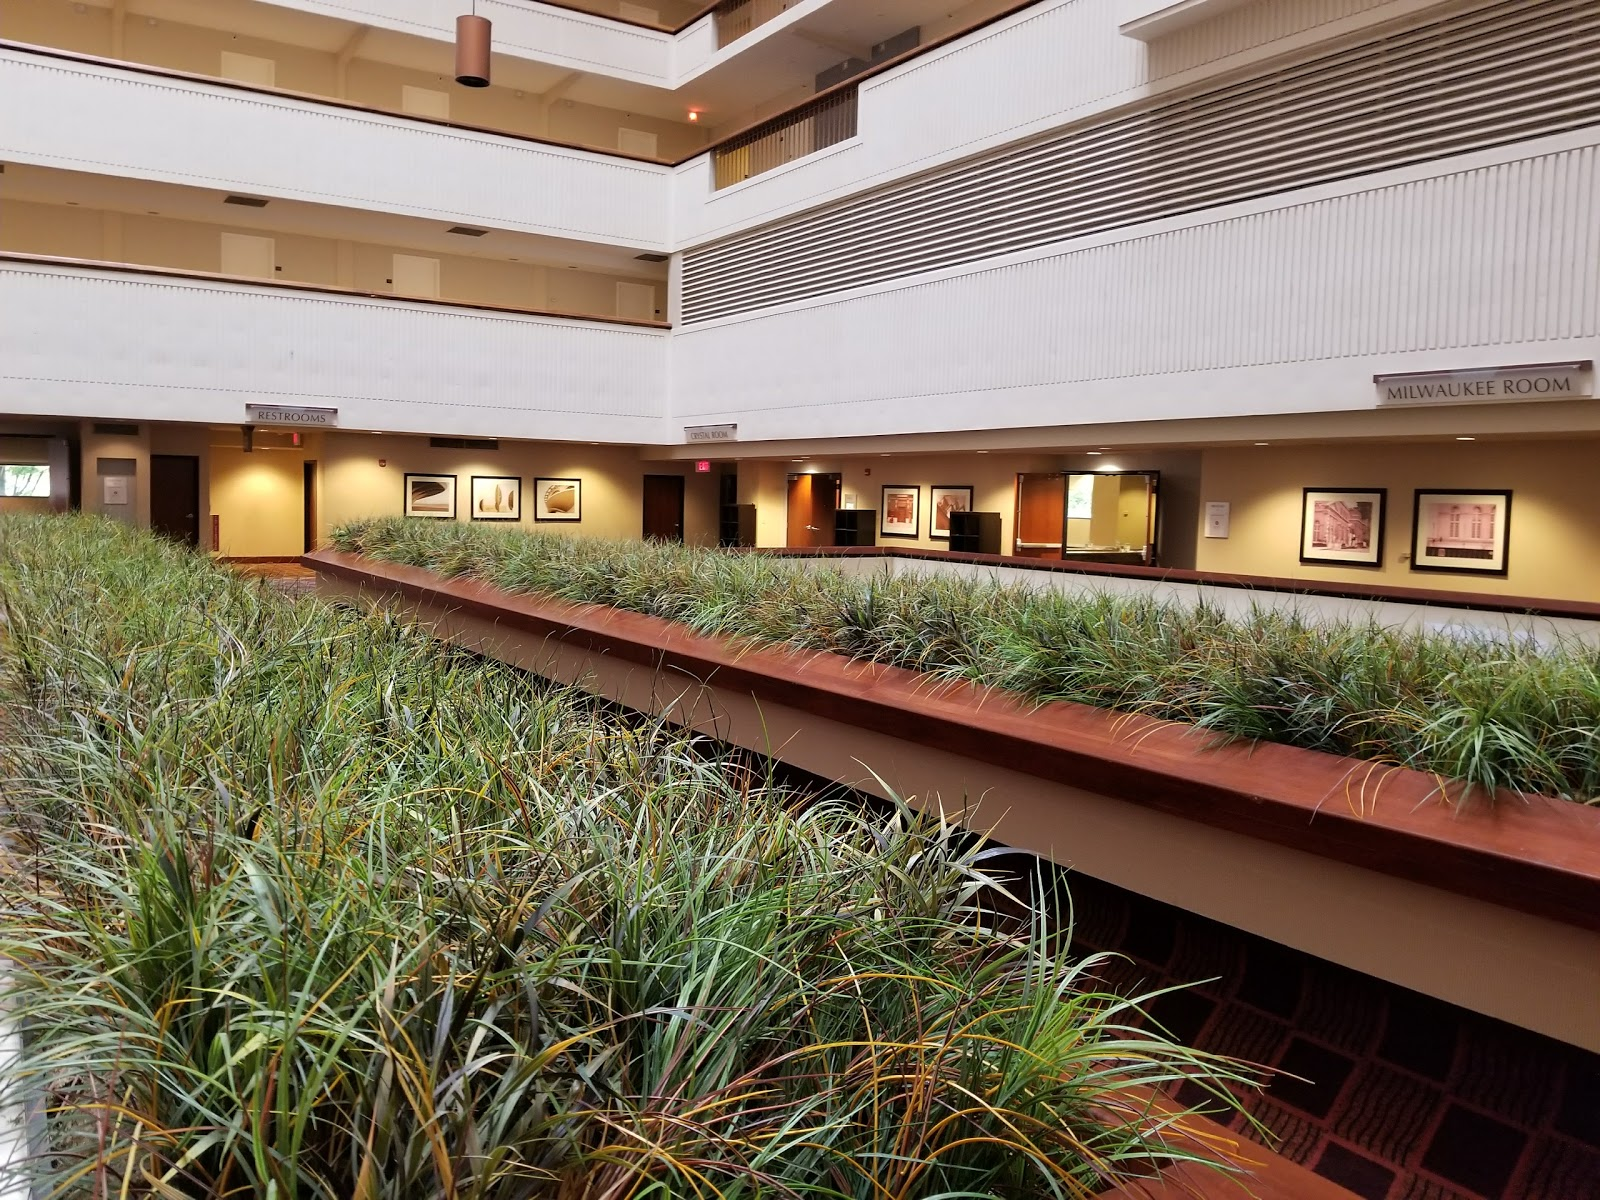 Hilton Garden Inn Milwaukee Downtown - Tripcarta